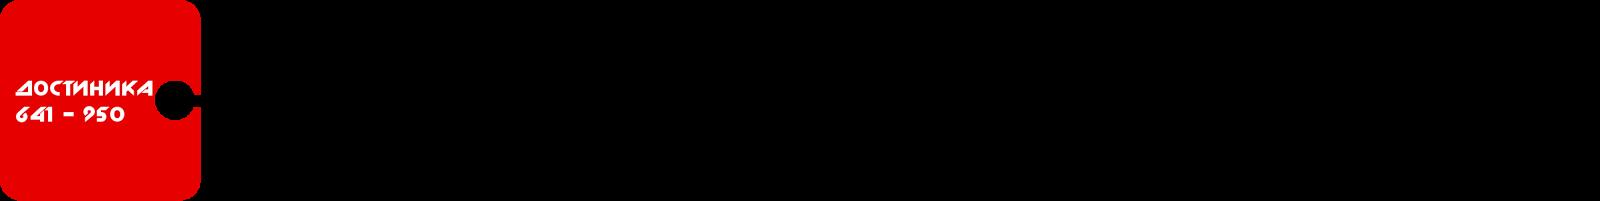 столица Достиника